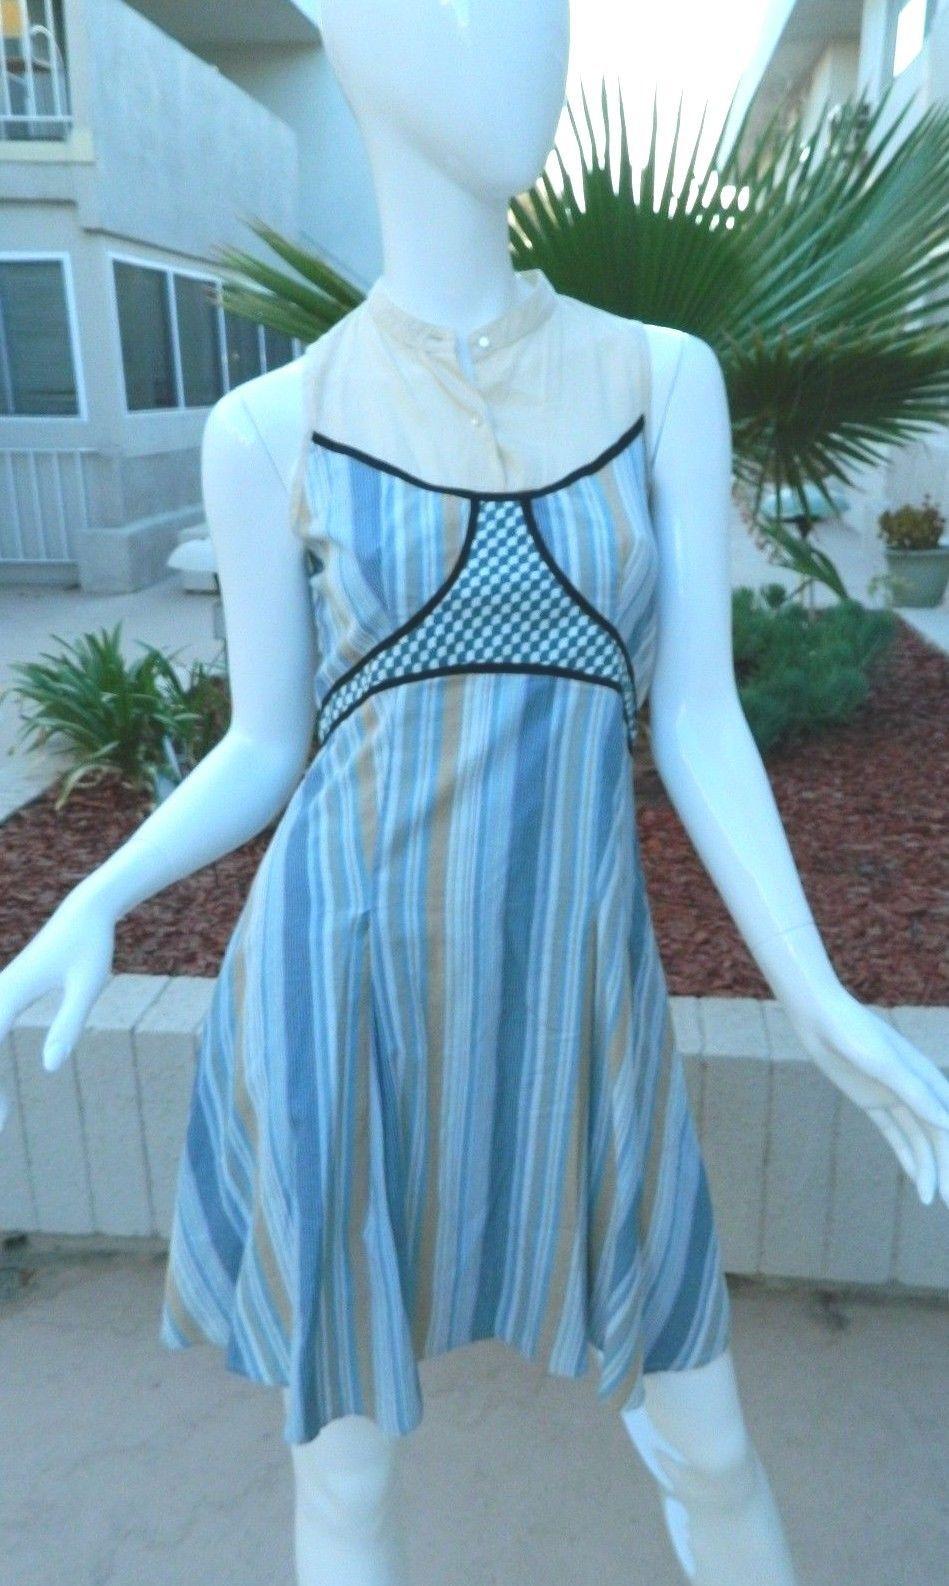 FREE PEOPLE Dress Cornflower Blue and Beige Striped 100% Cotton Dress-Size 4